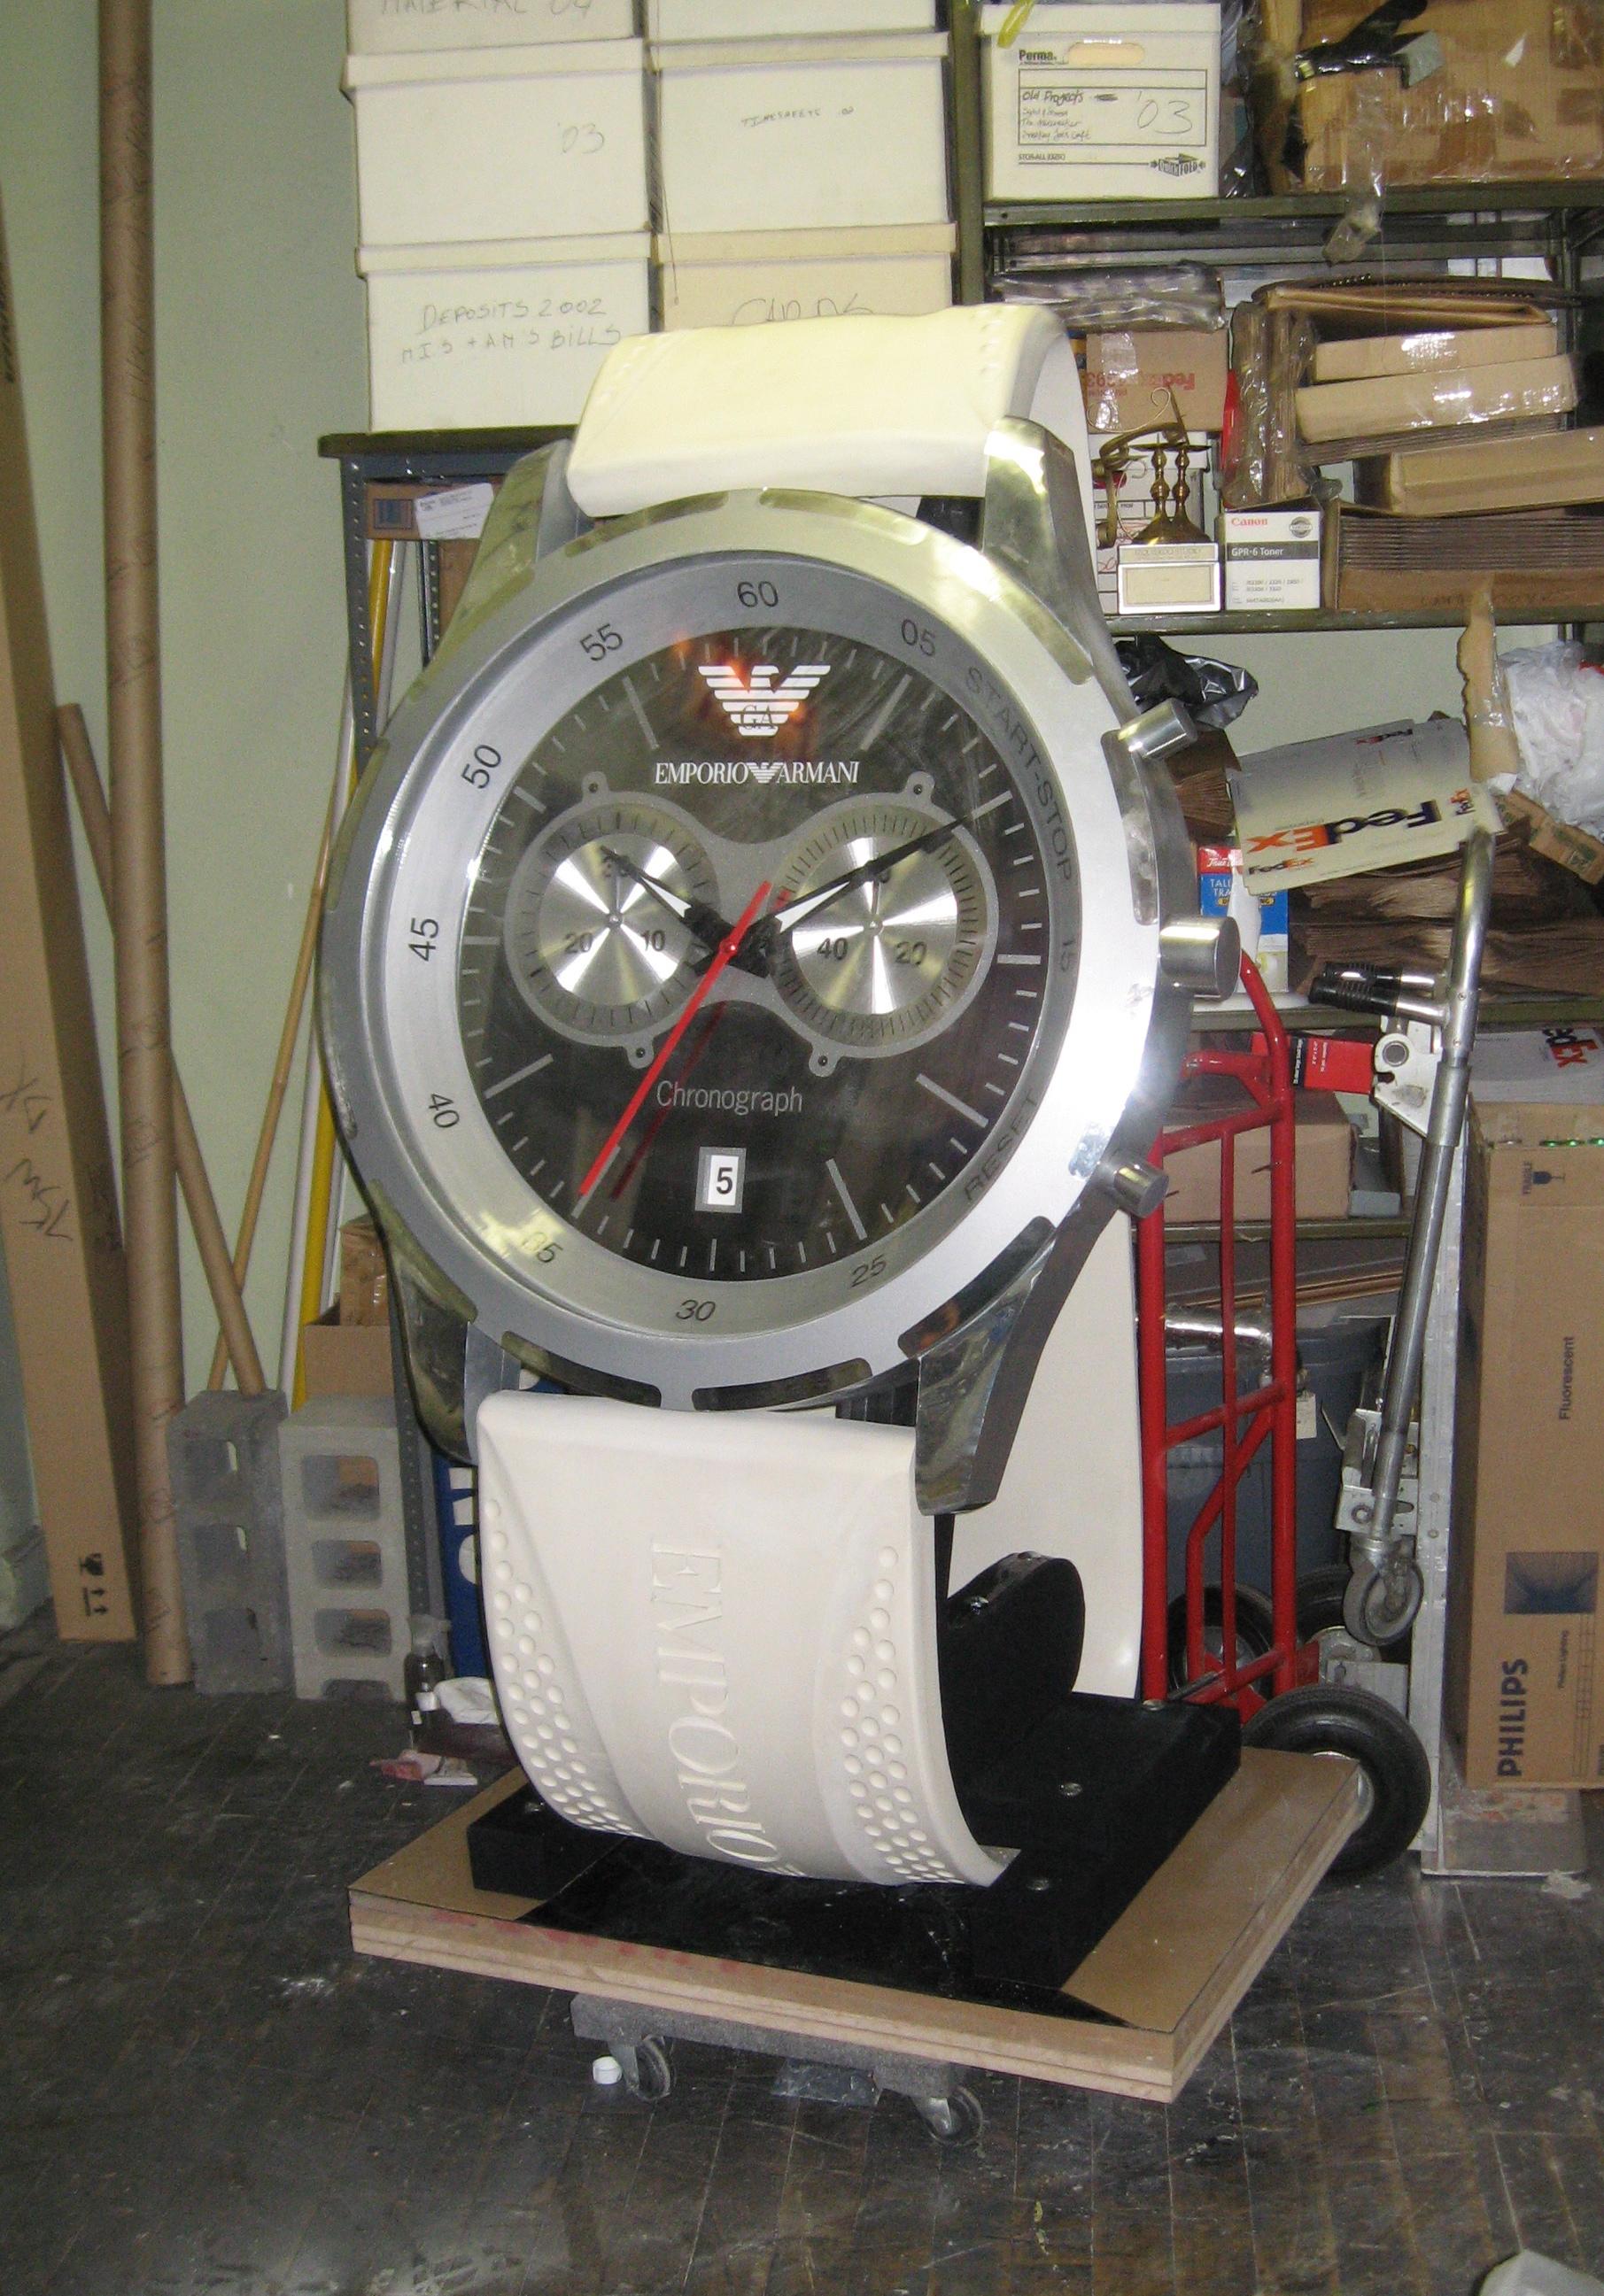 Armani Giant Watch